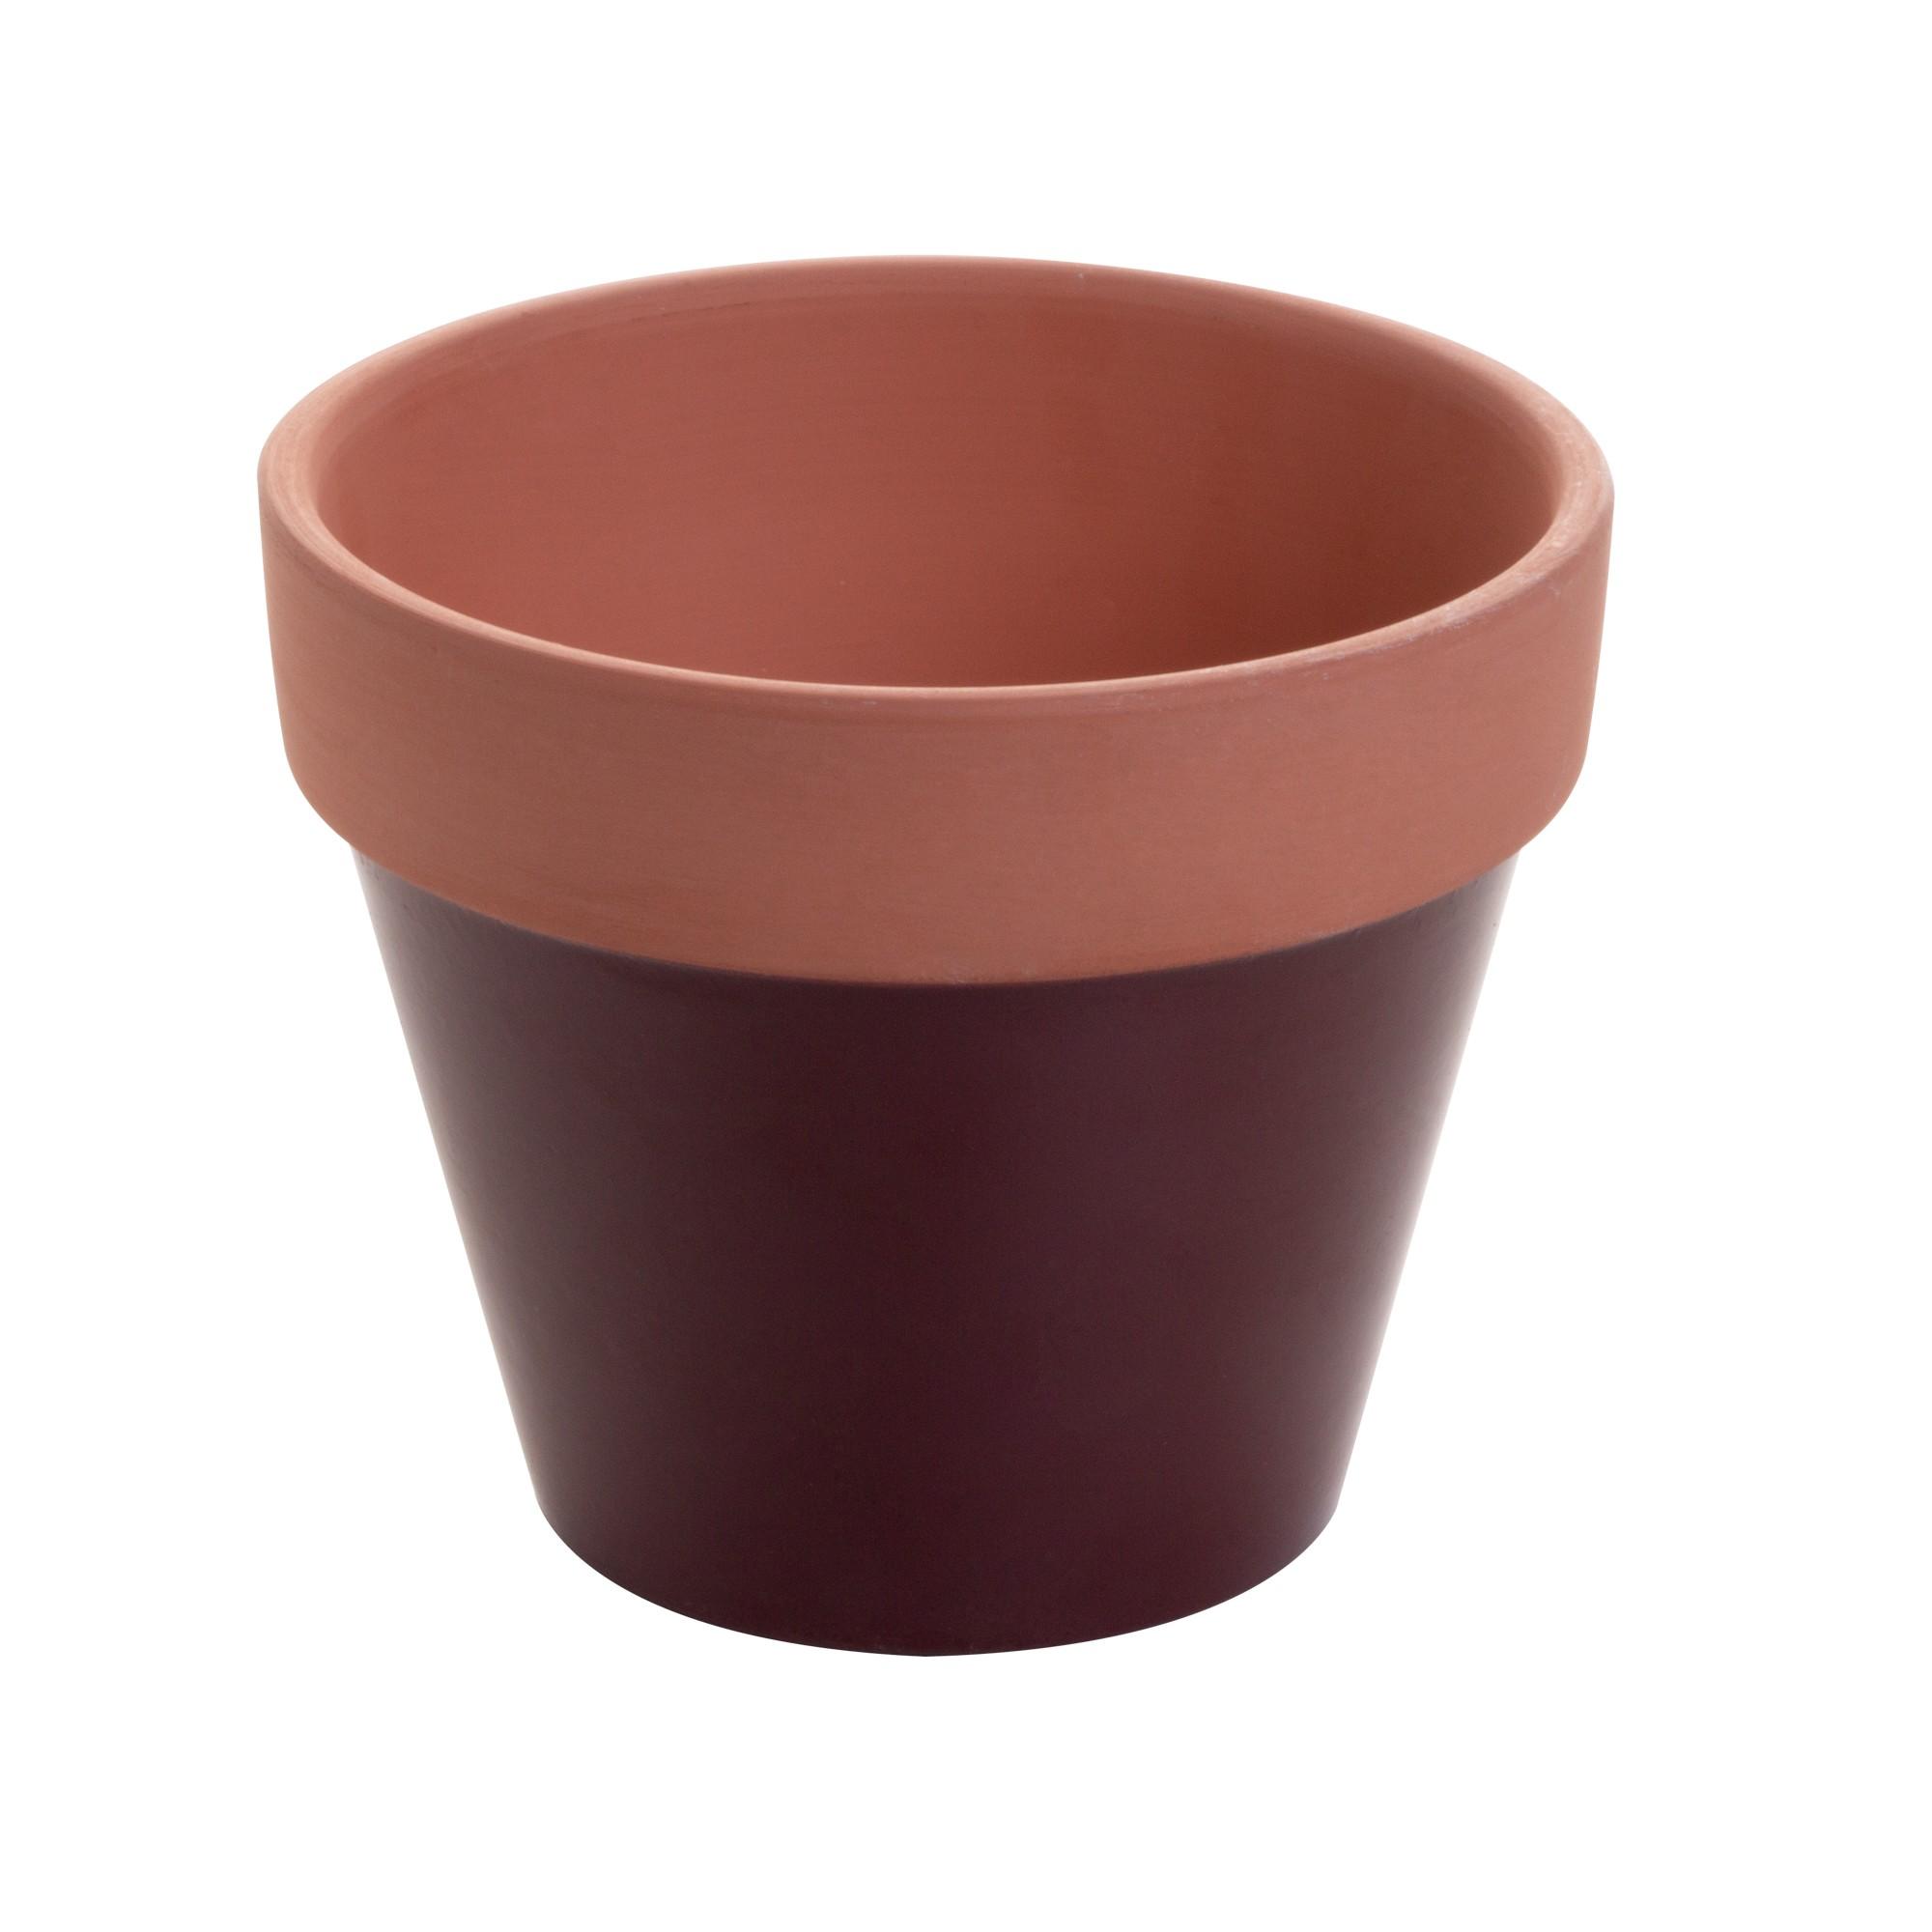 Vaso Decorativo de Ceramica Redondo 12 cm - Urban